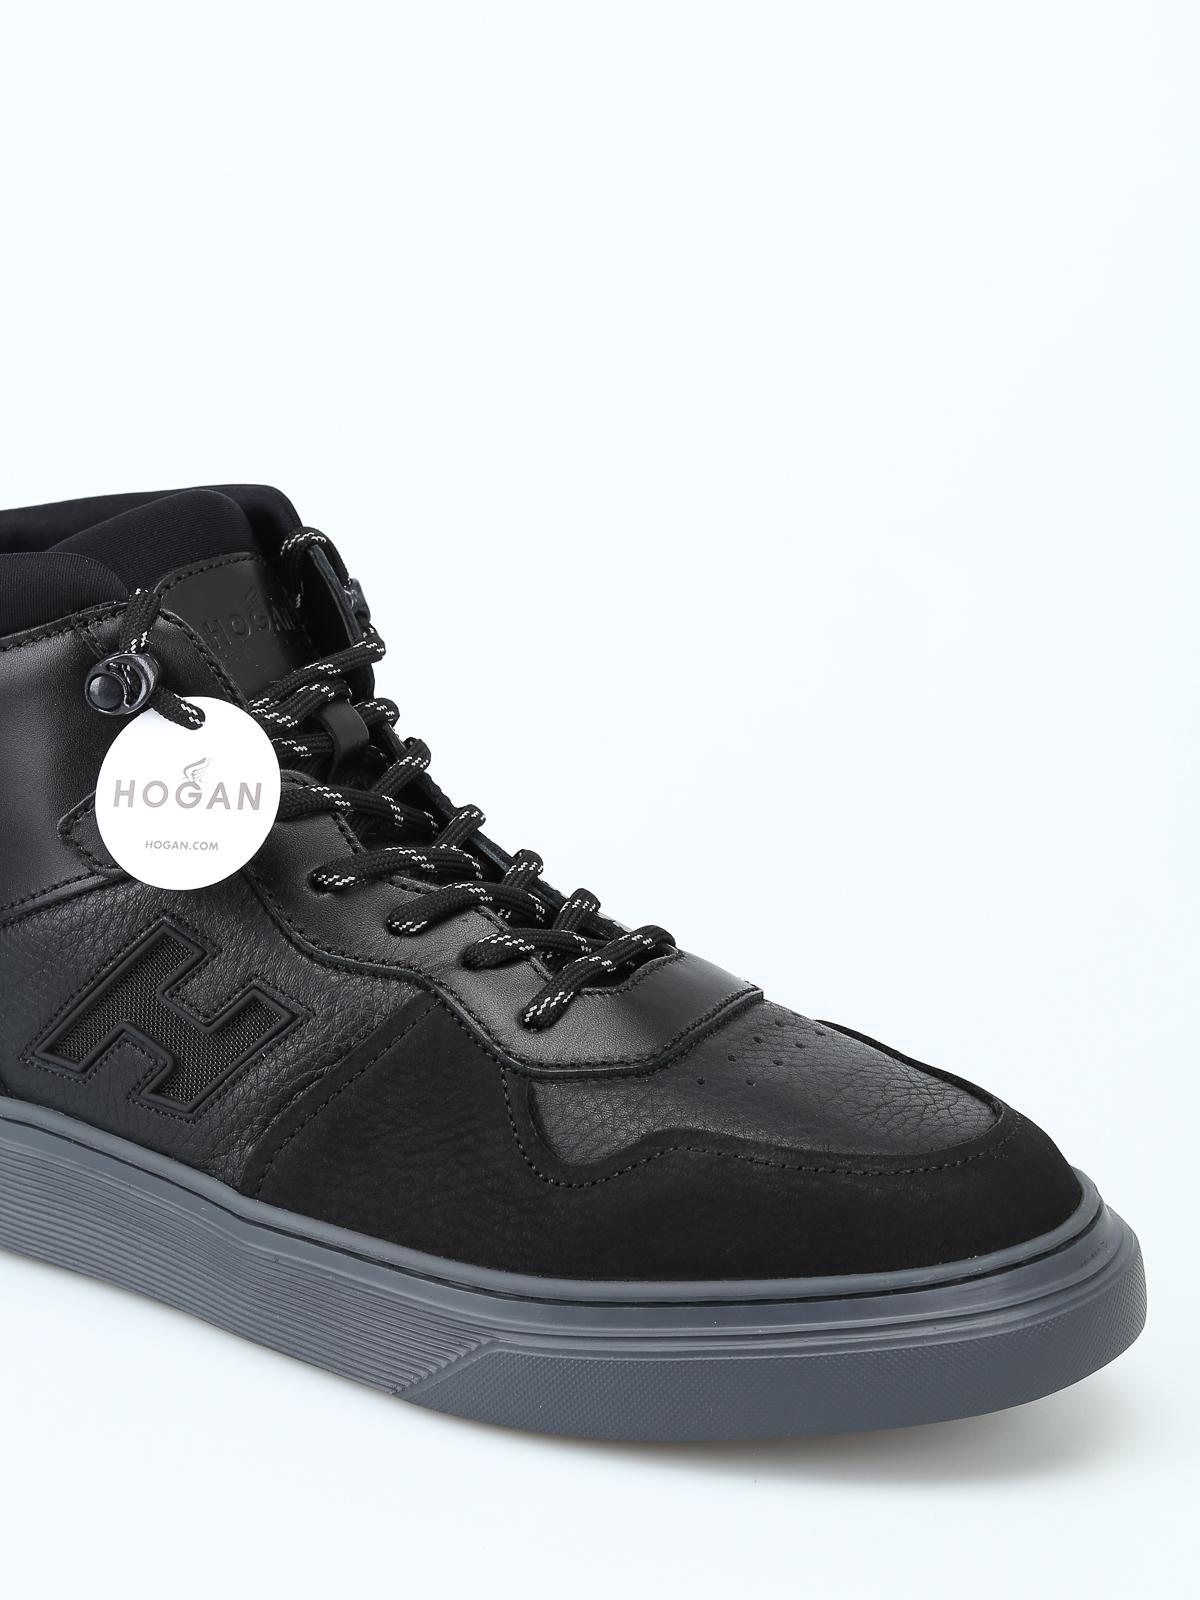 d4c053b6e8 iKRIX HOGAN: sneakers - Sneaker alte H365 nere modello basket